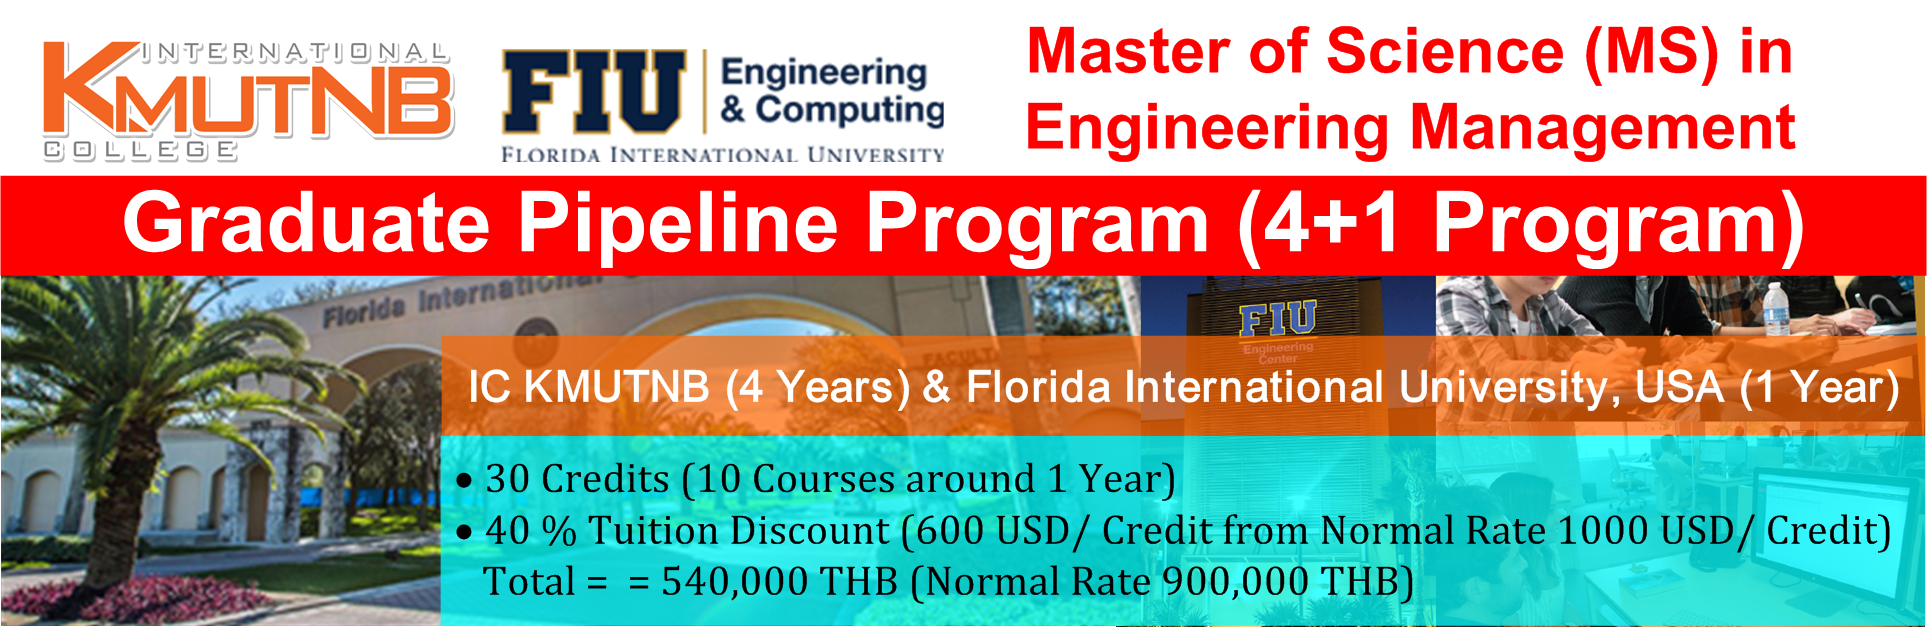 Graduate Pipeline Program (4+1 Program)